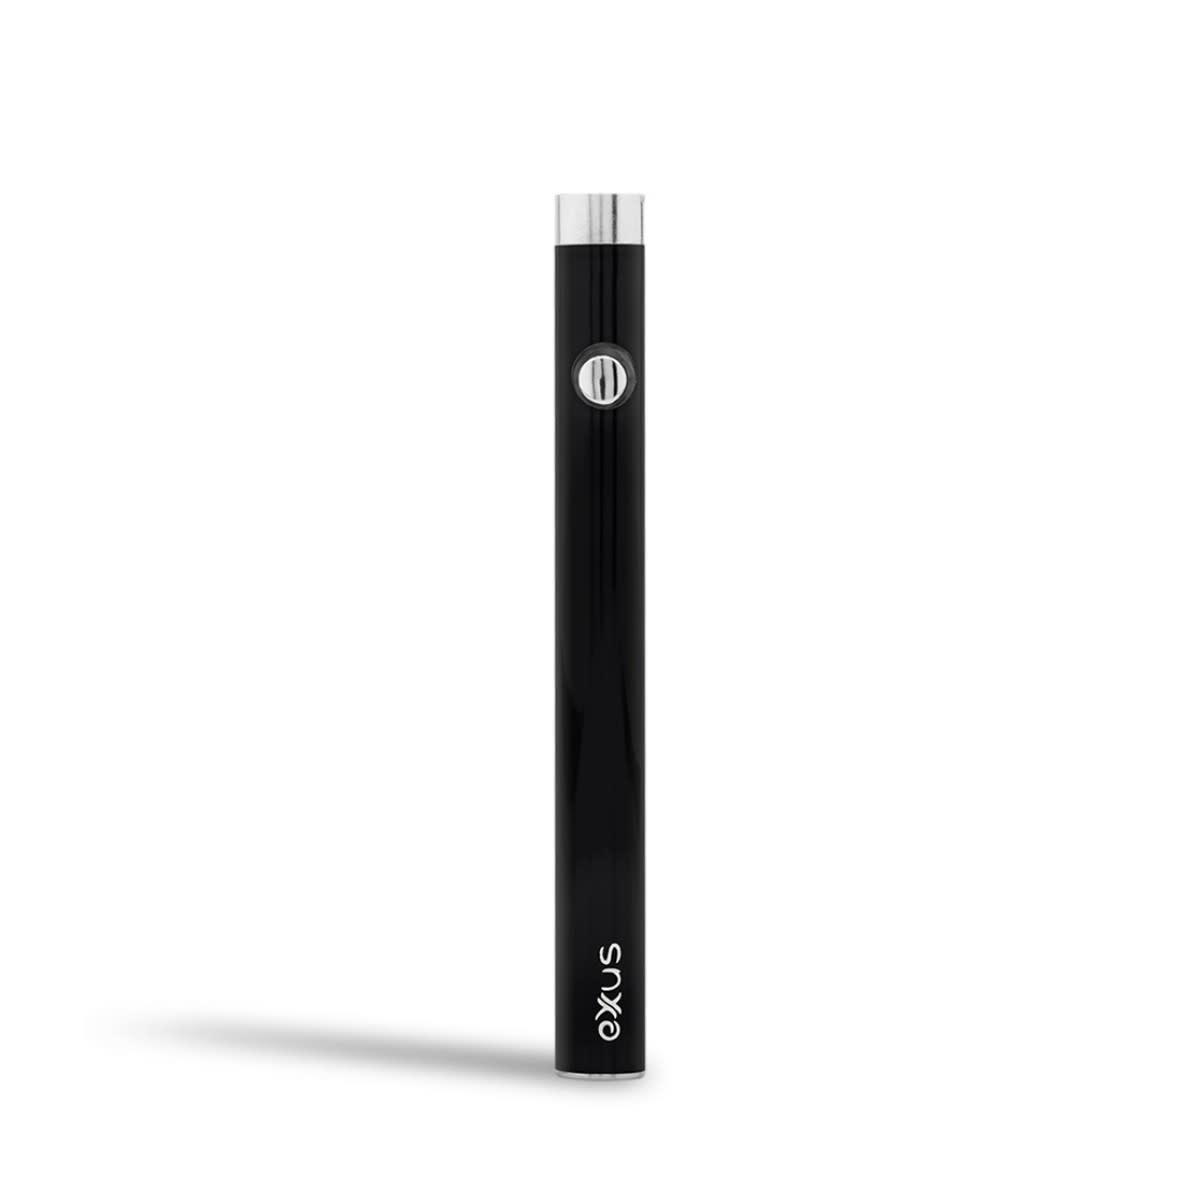 Exxus Slim VV Cartridge Battery Cosmic Black